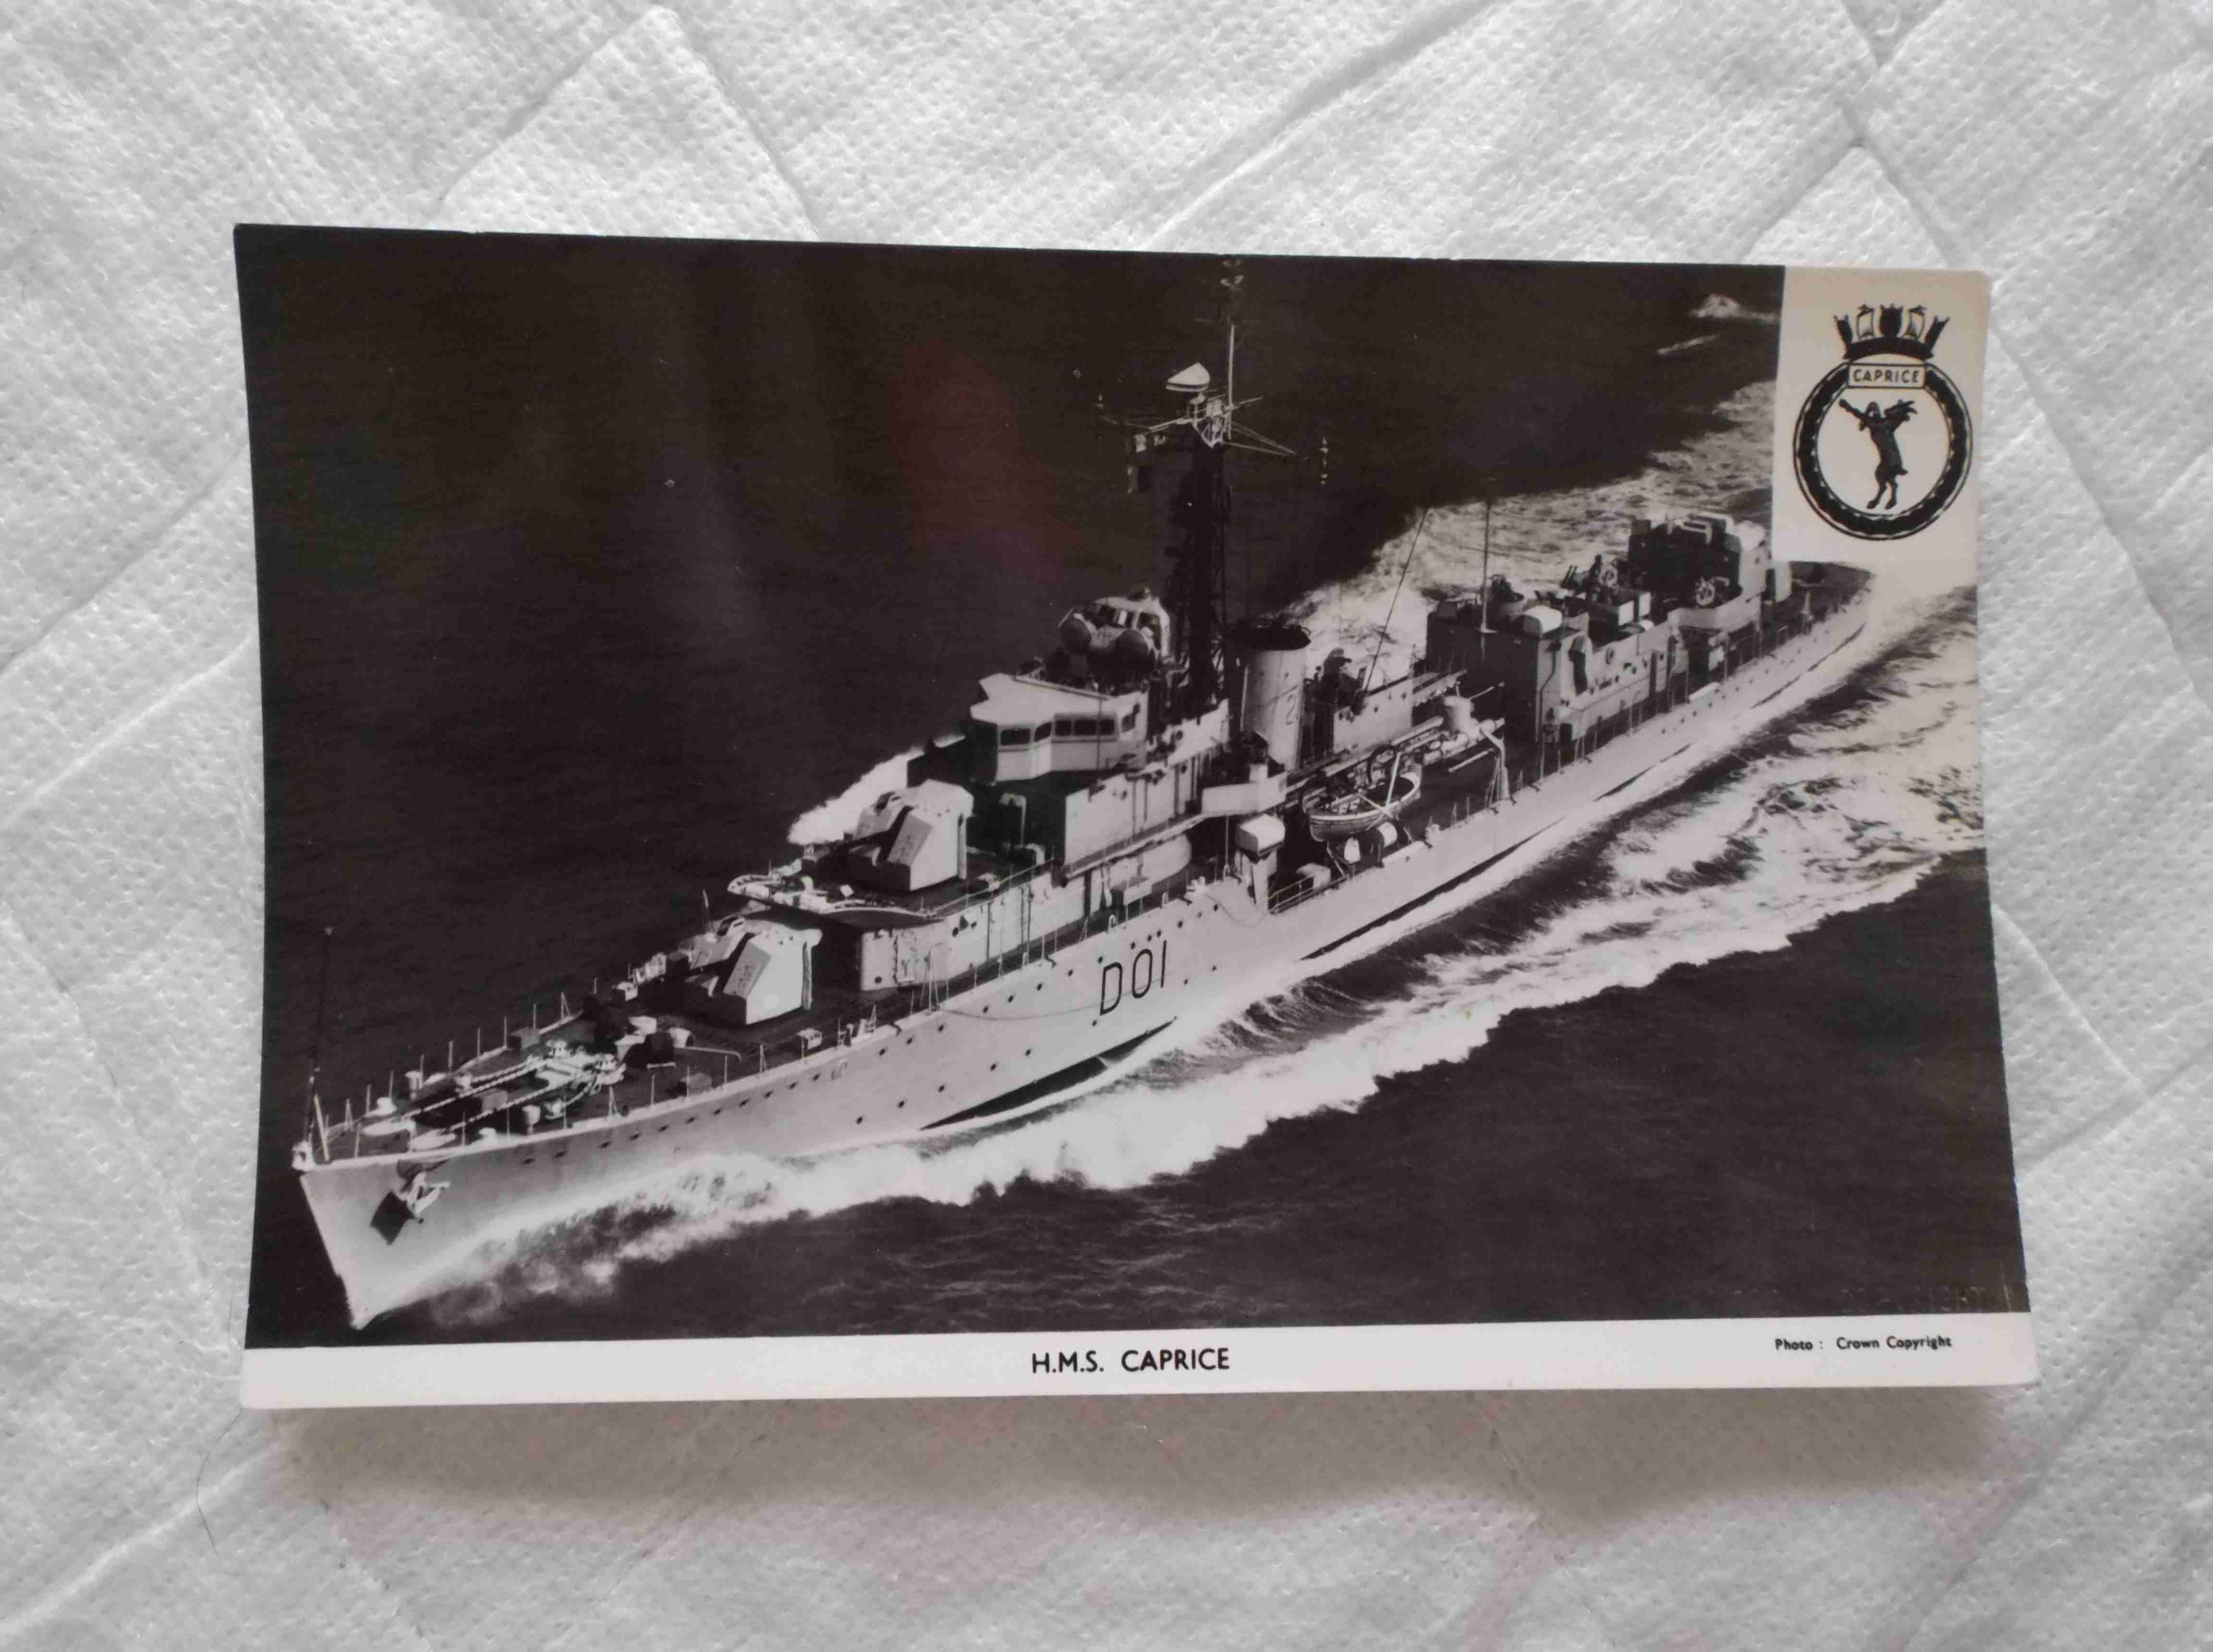 POSTCARD OF THE ROYAL NAVAL VESSEL HMS CAPRICE